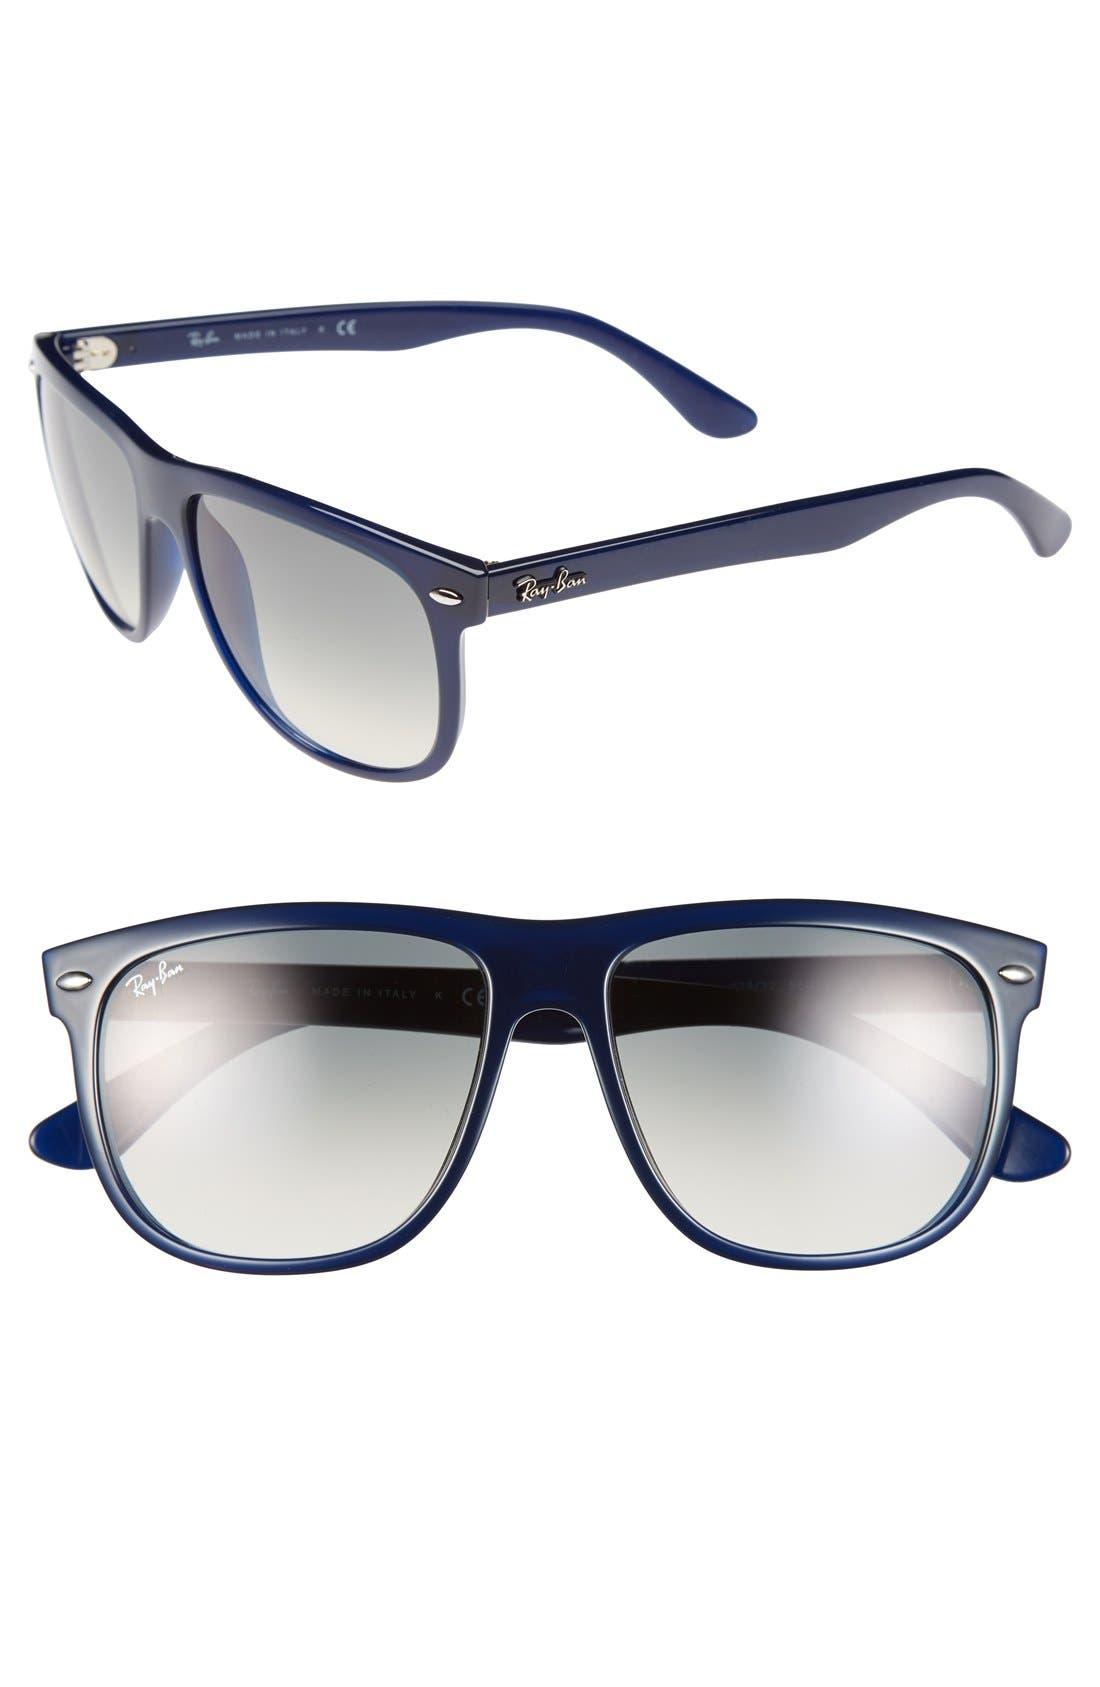 Main Image - Ray-Ban 'Boyfriend Flat Top Frame' 56mm Sunglasses